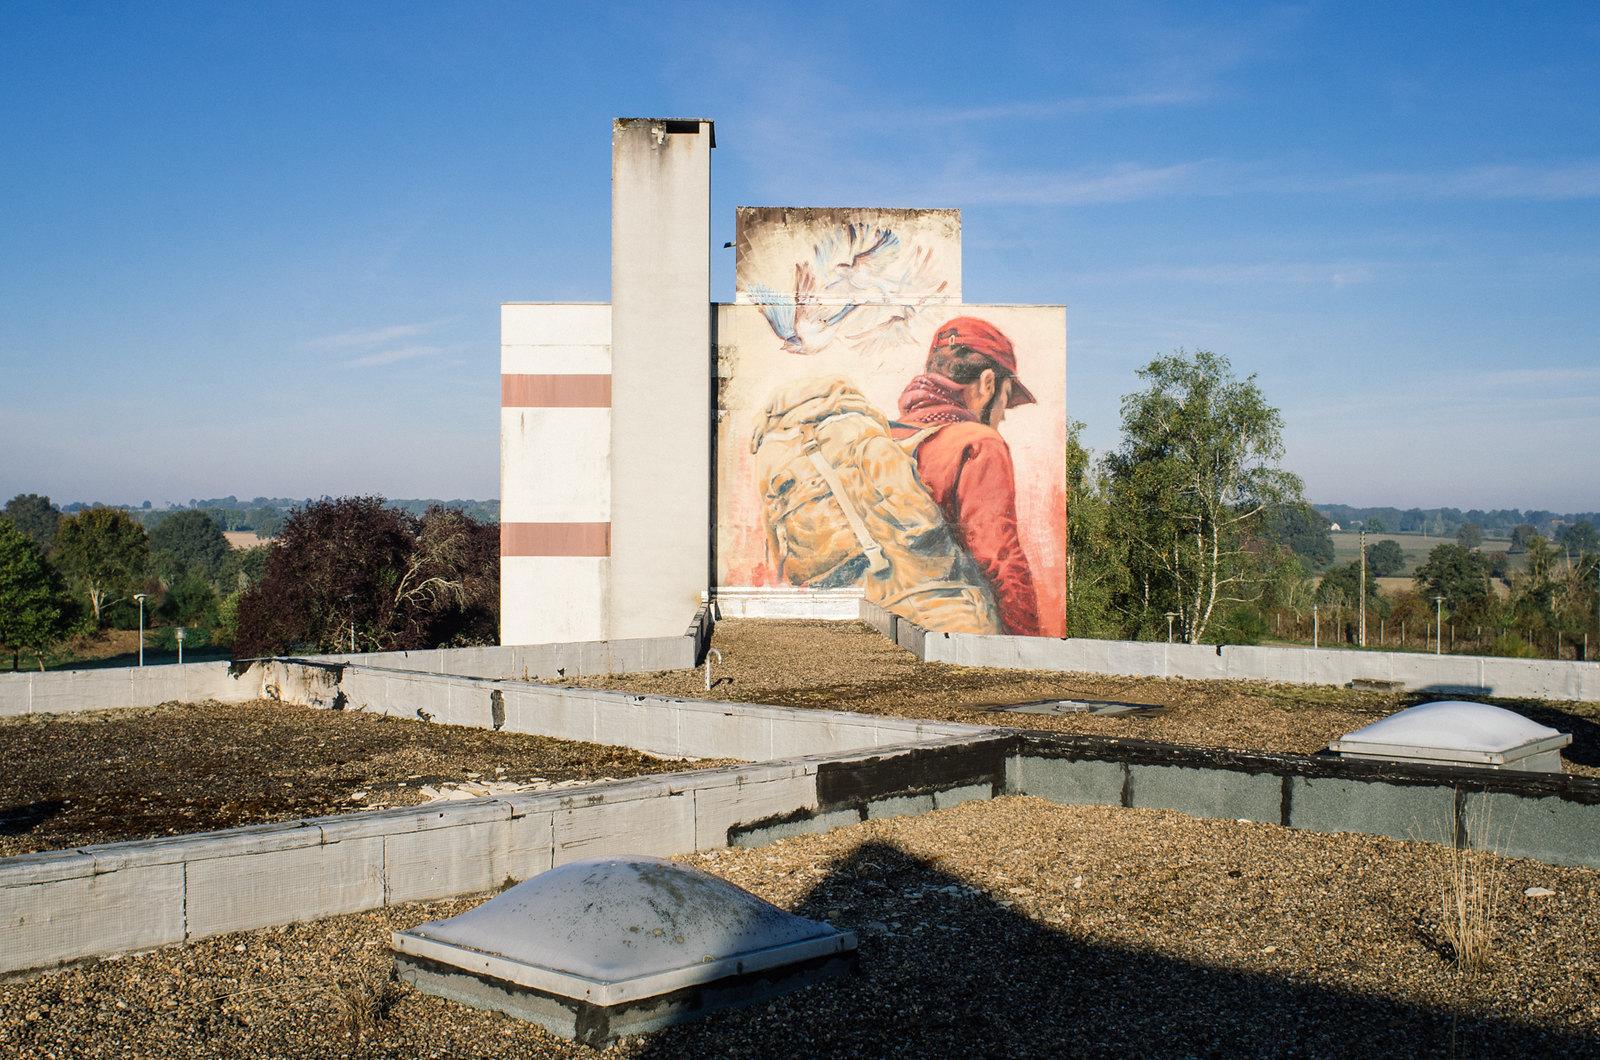 Street art city, paradis du street art - Carnet de voyage en France